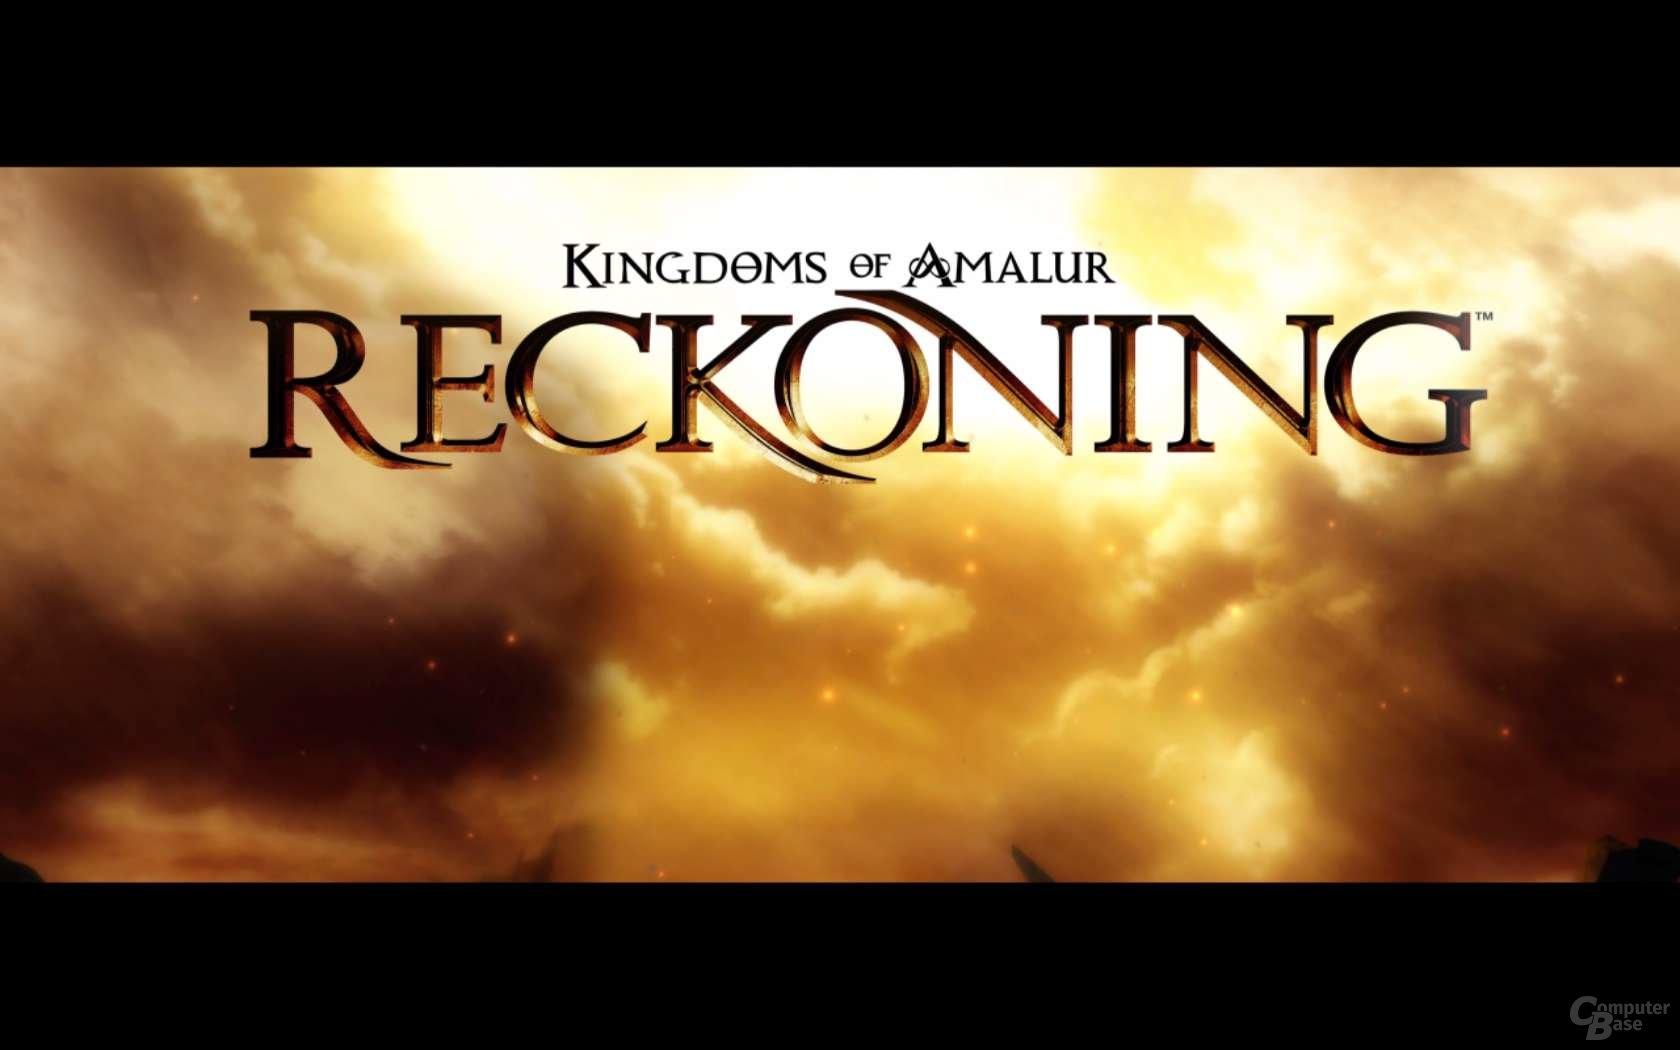 Kingdomgs of Amaluar: Reckoning